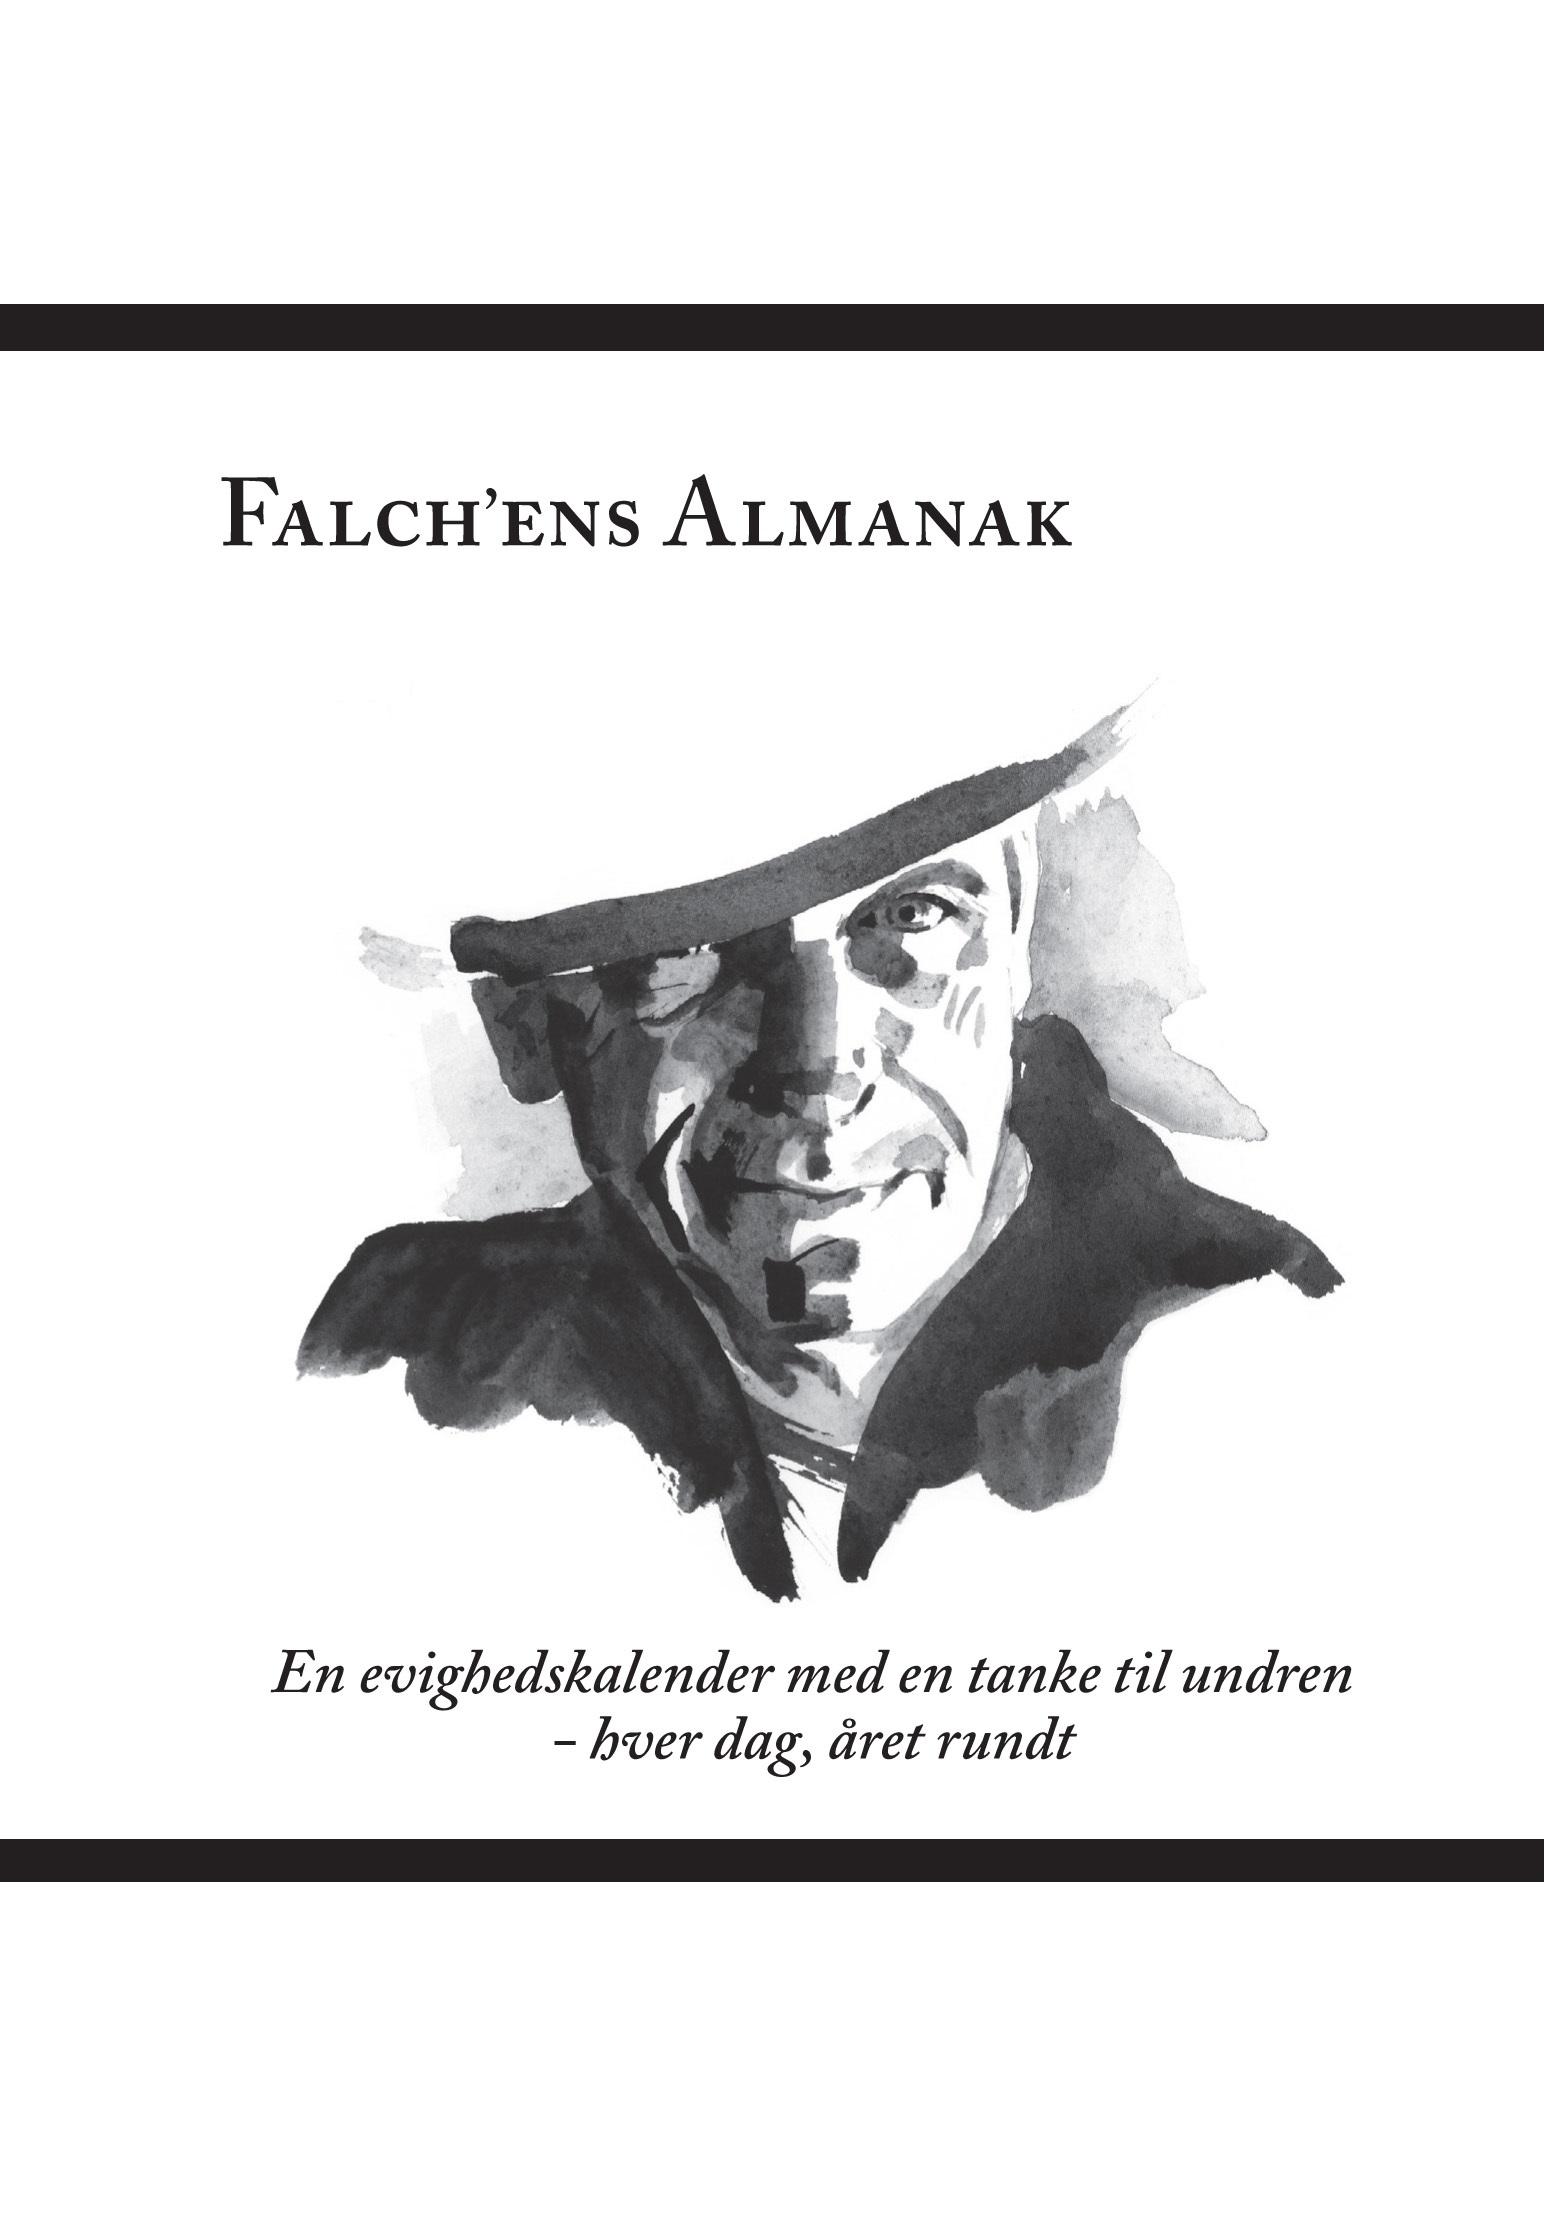 Falch'ens Almanak - Mariette Højsgaard og Michael Falch - Bøger -  - 9788797071700 - 26/10-2018